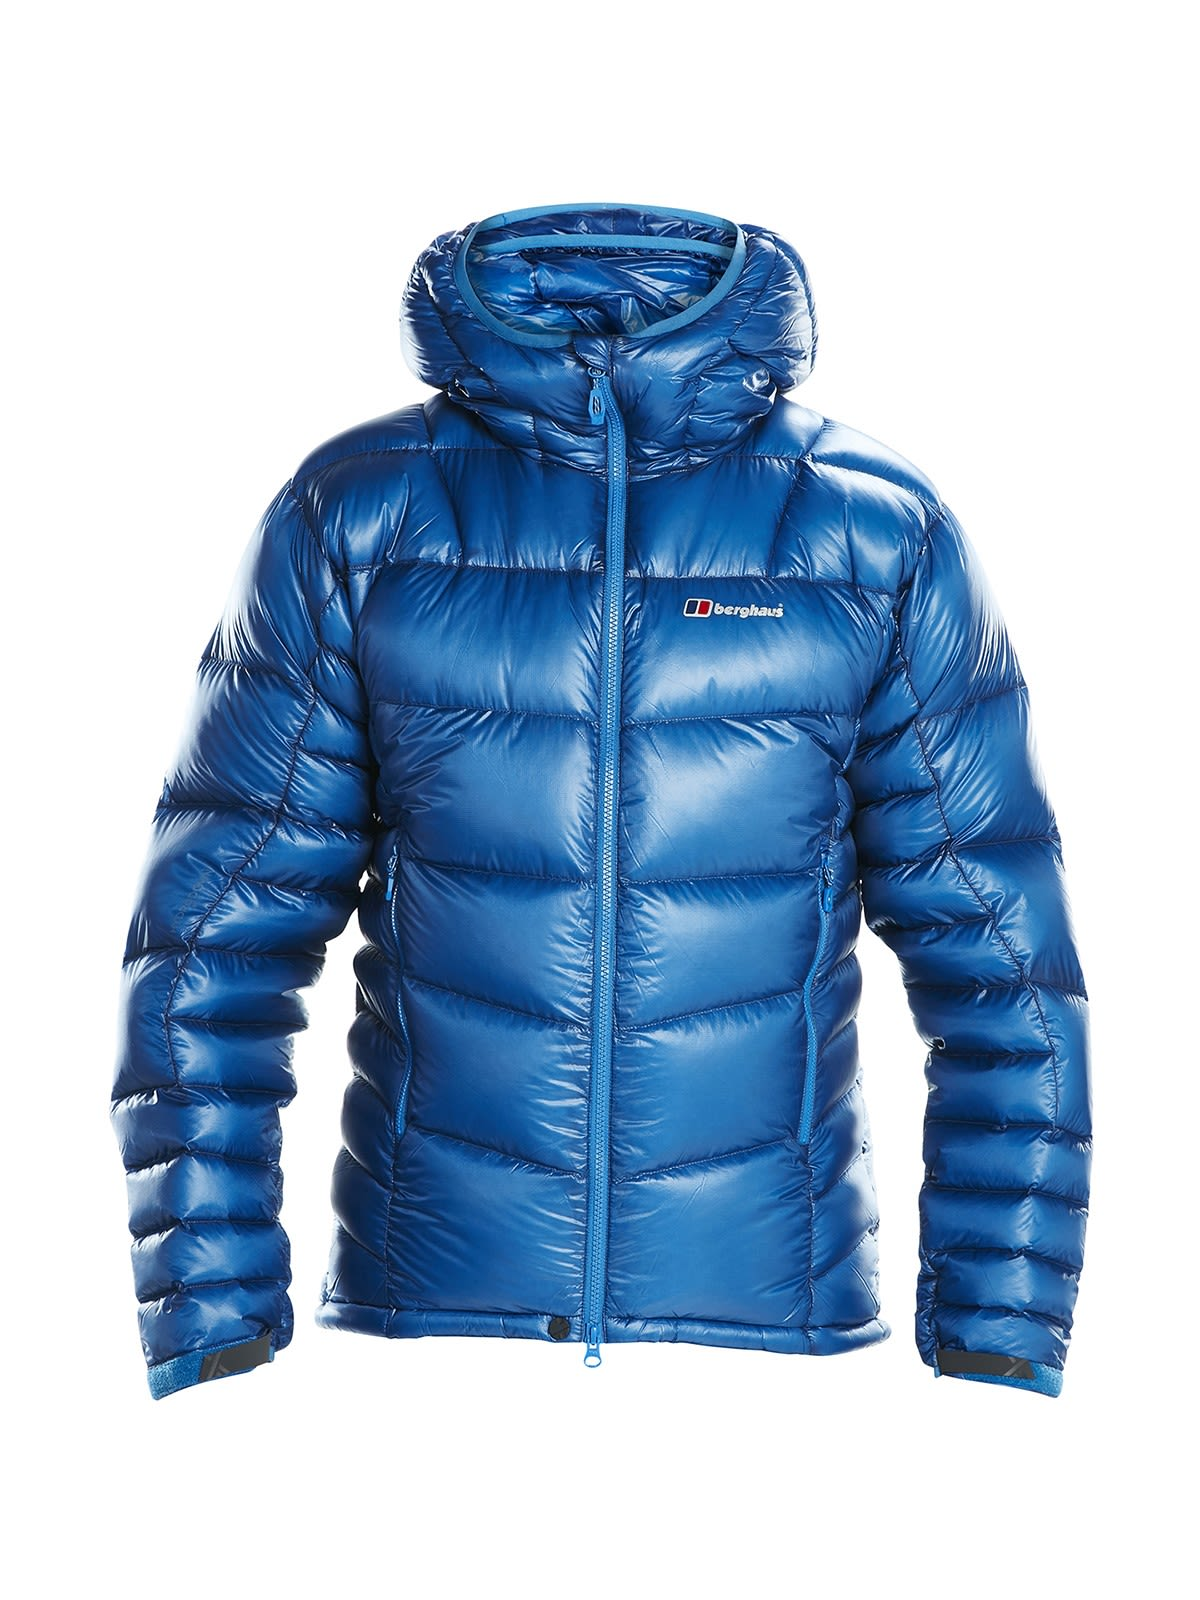 Berghaus M Ramche 2.0 Down Jacket | Größe XS,XL | Herren Daunenjacke